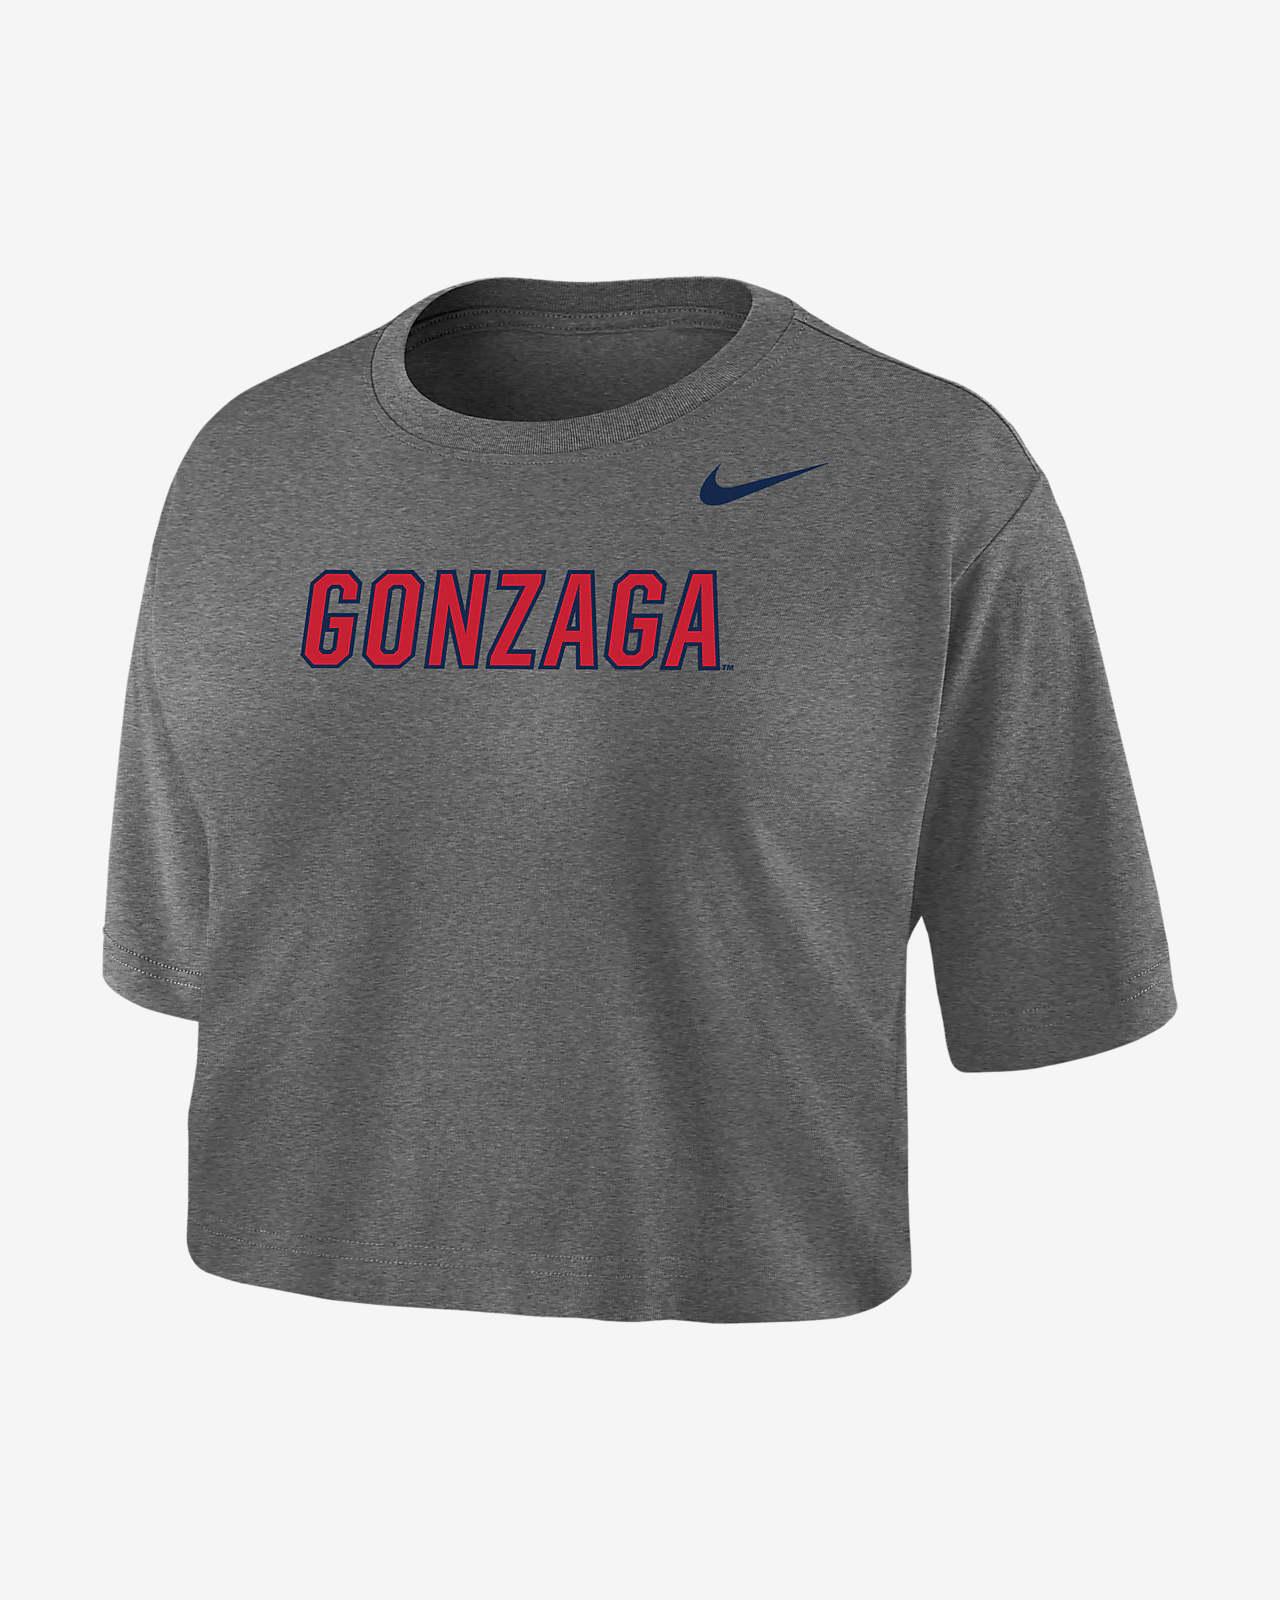 Nike College Dri-FIT (Gonzaga) Women's Crop T-Shirt